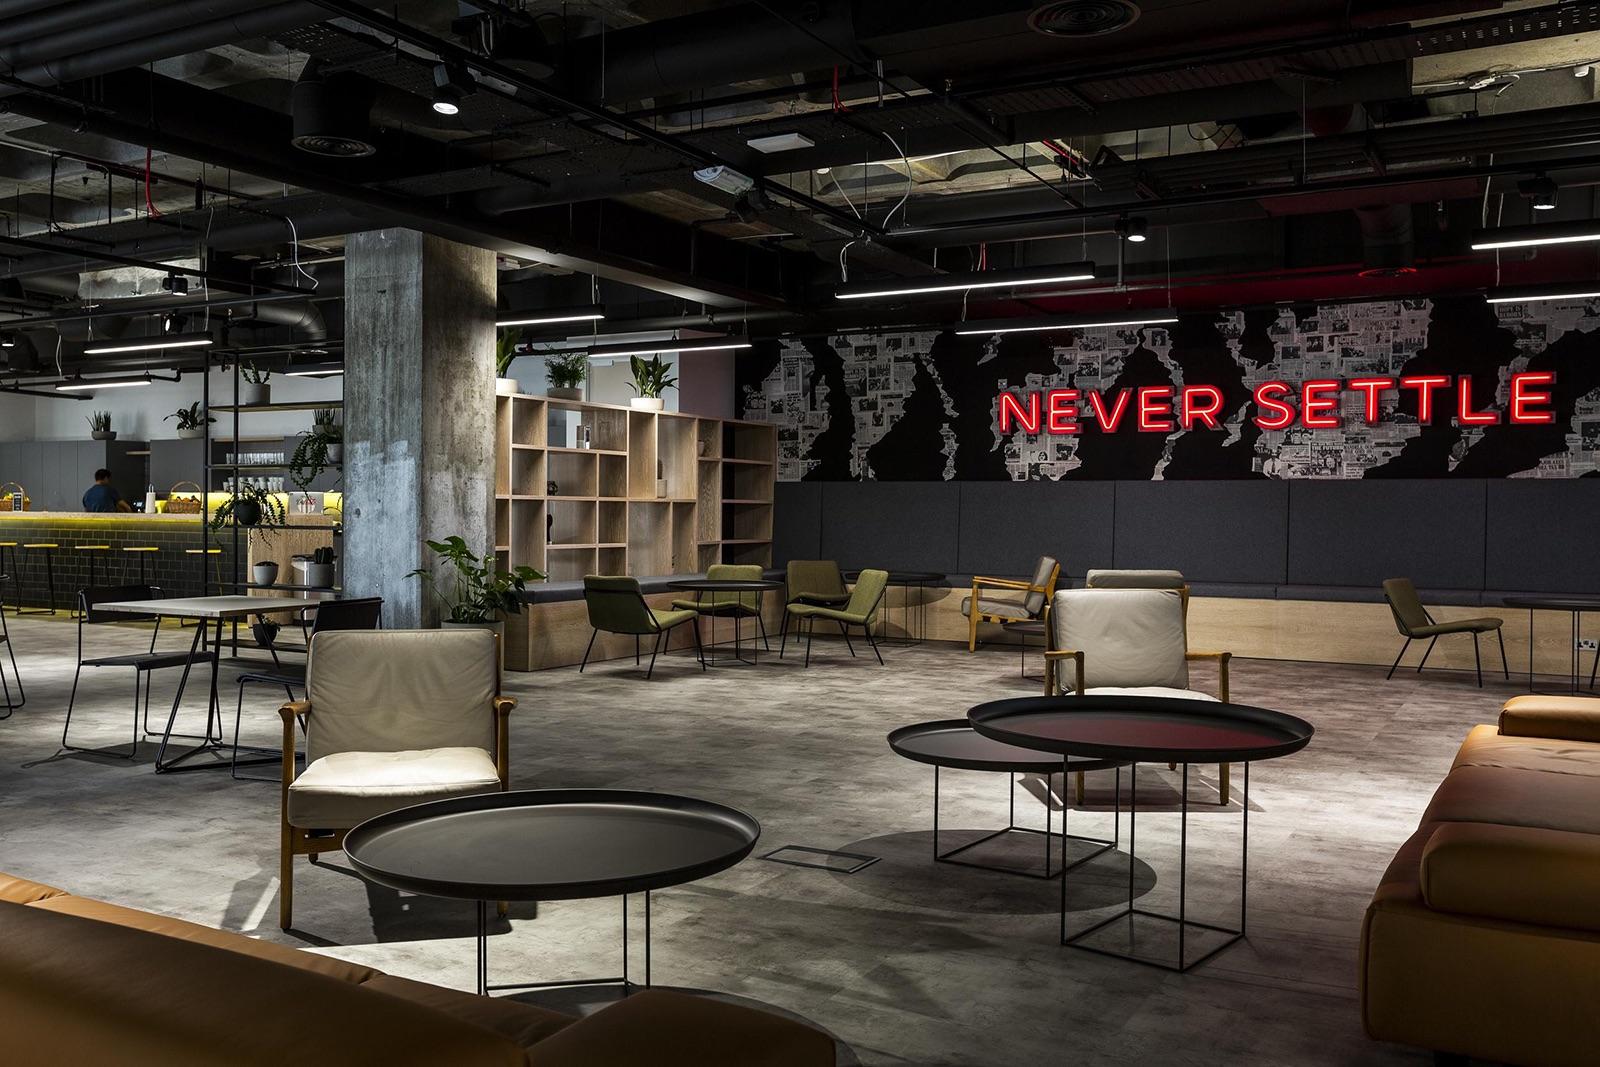 revolut-office-london-8